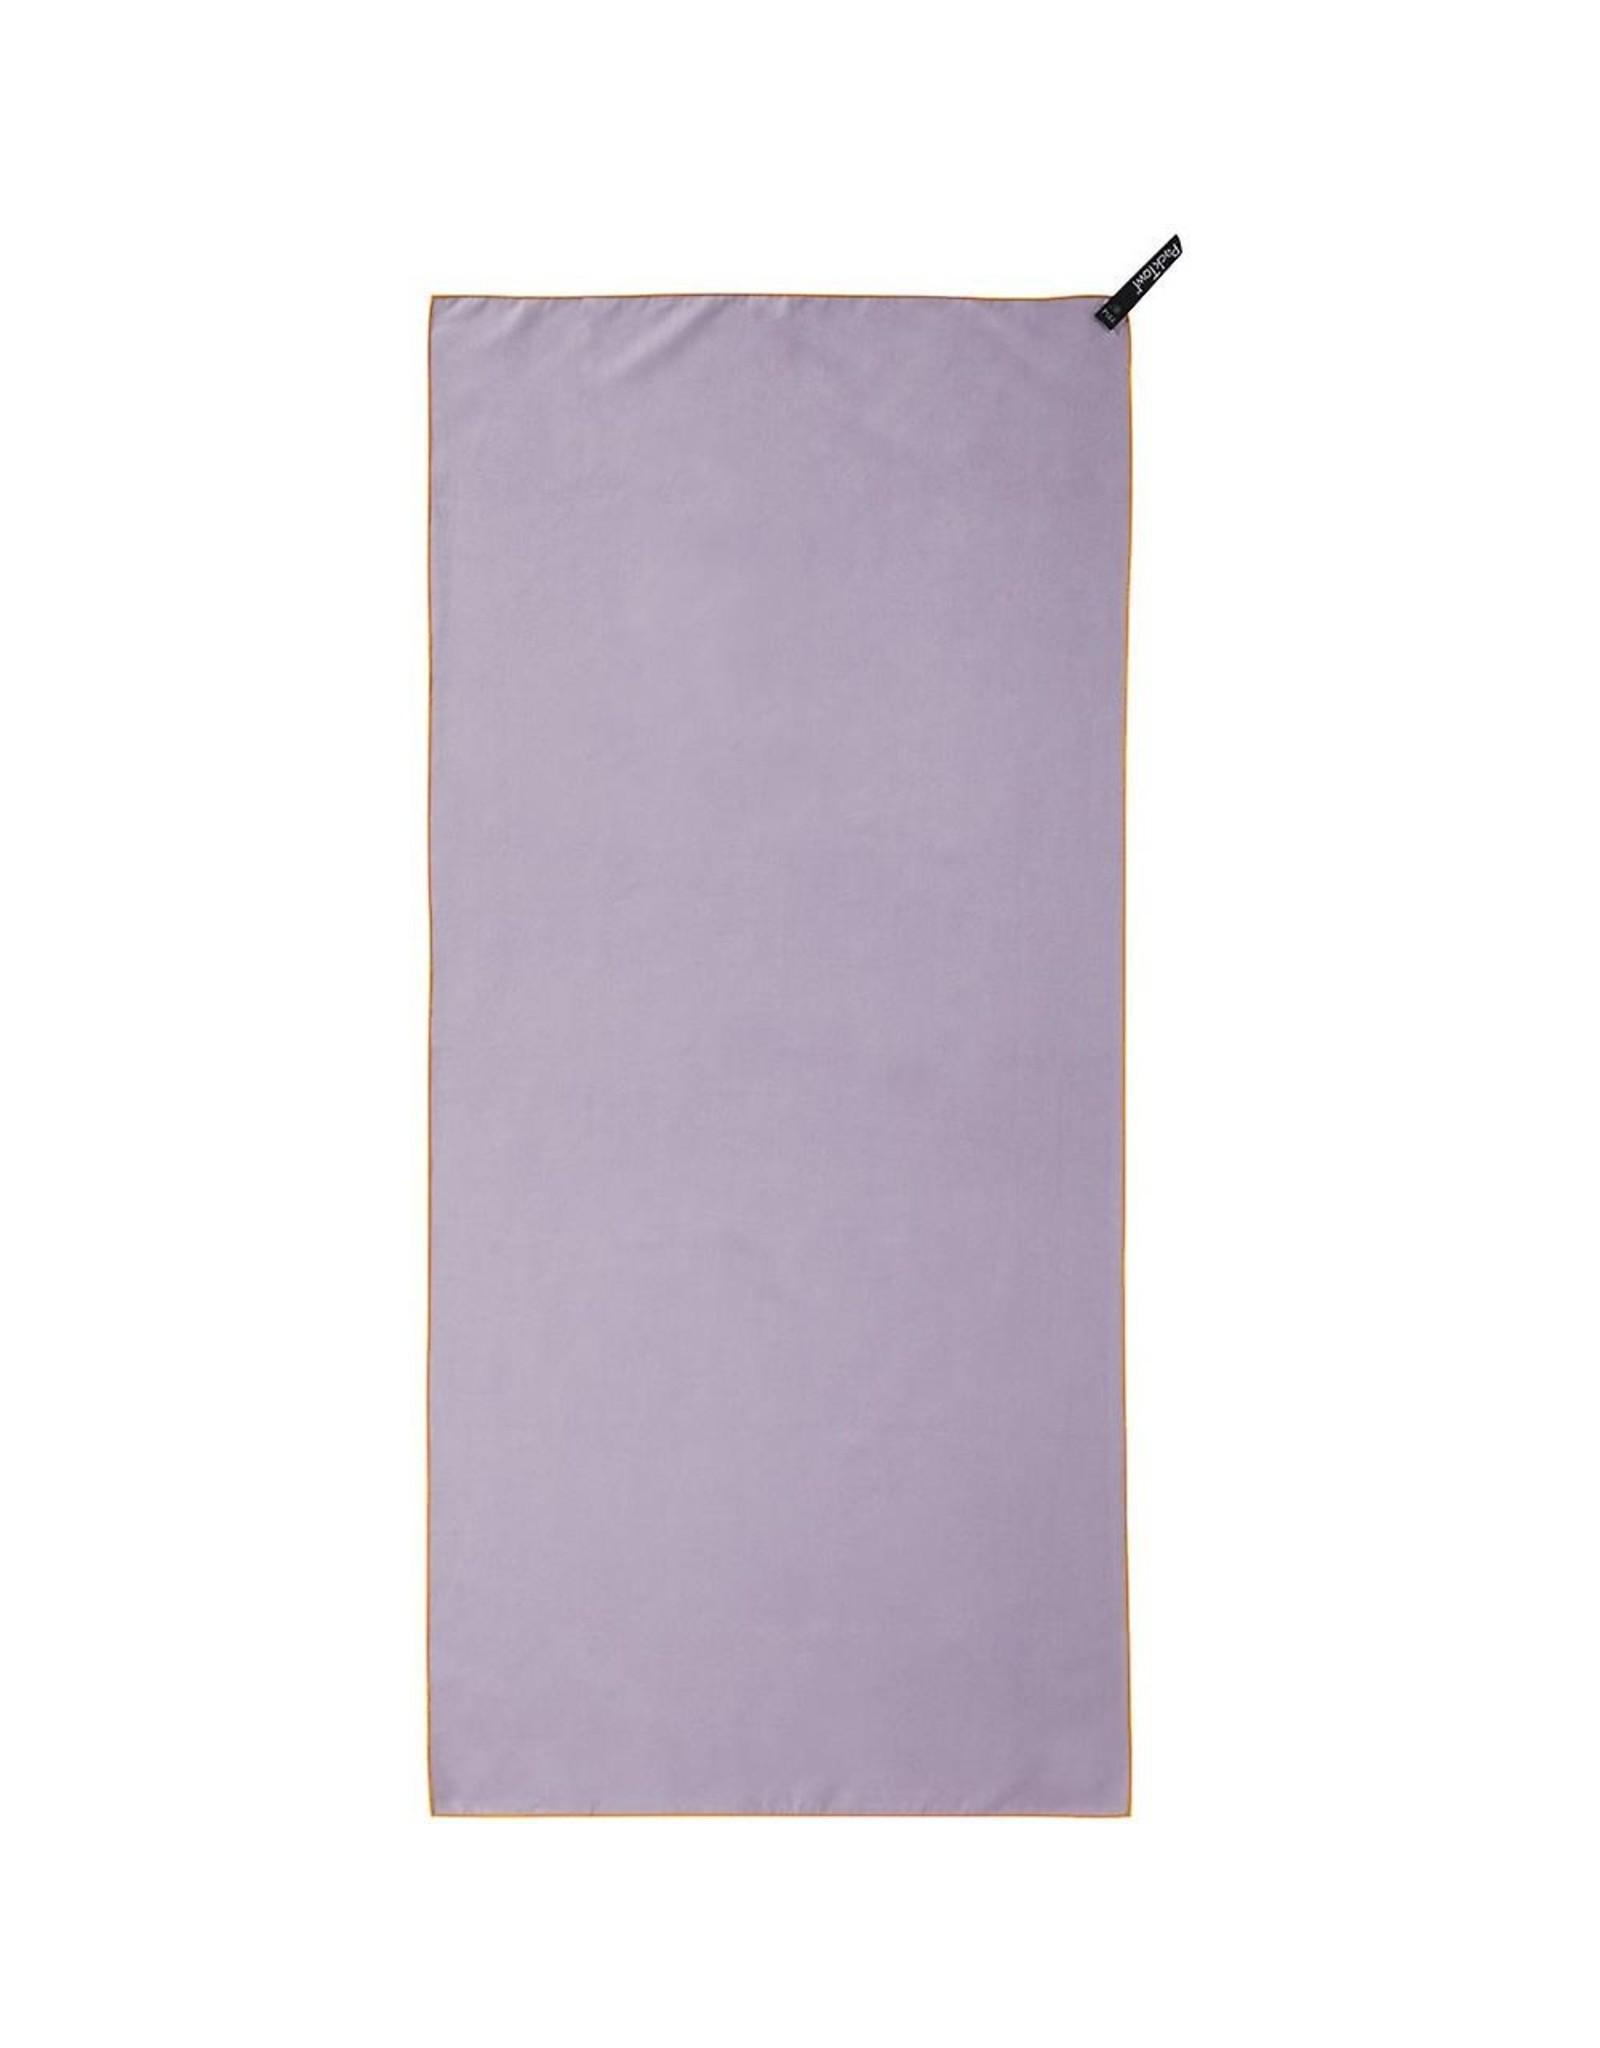 PackTowl PackTowl Personal Body Towel Dusk